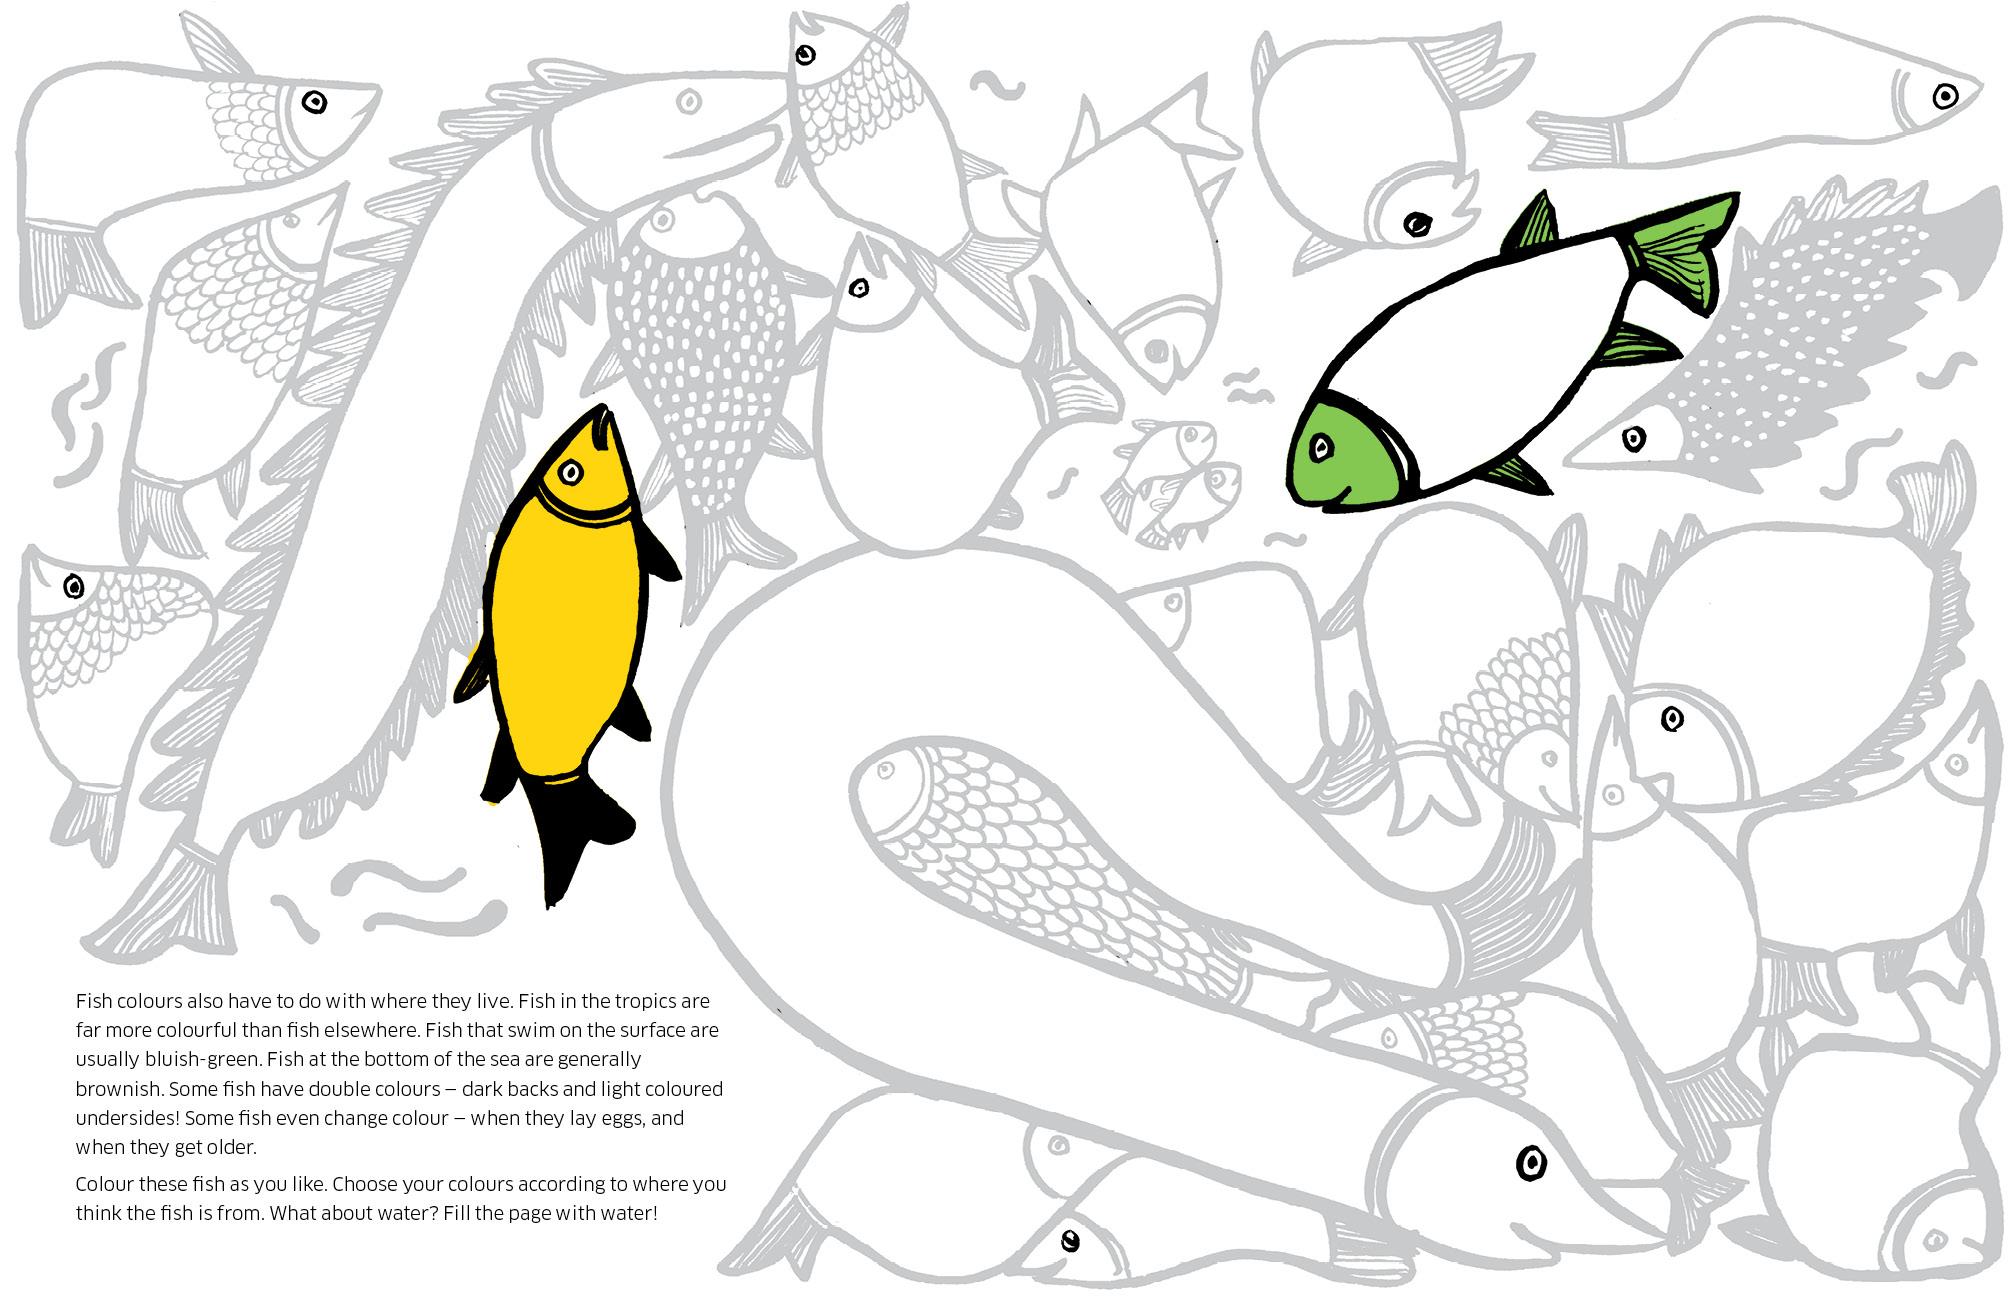 8 ways to draw a fish spread_LR3.jpg